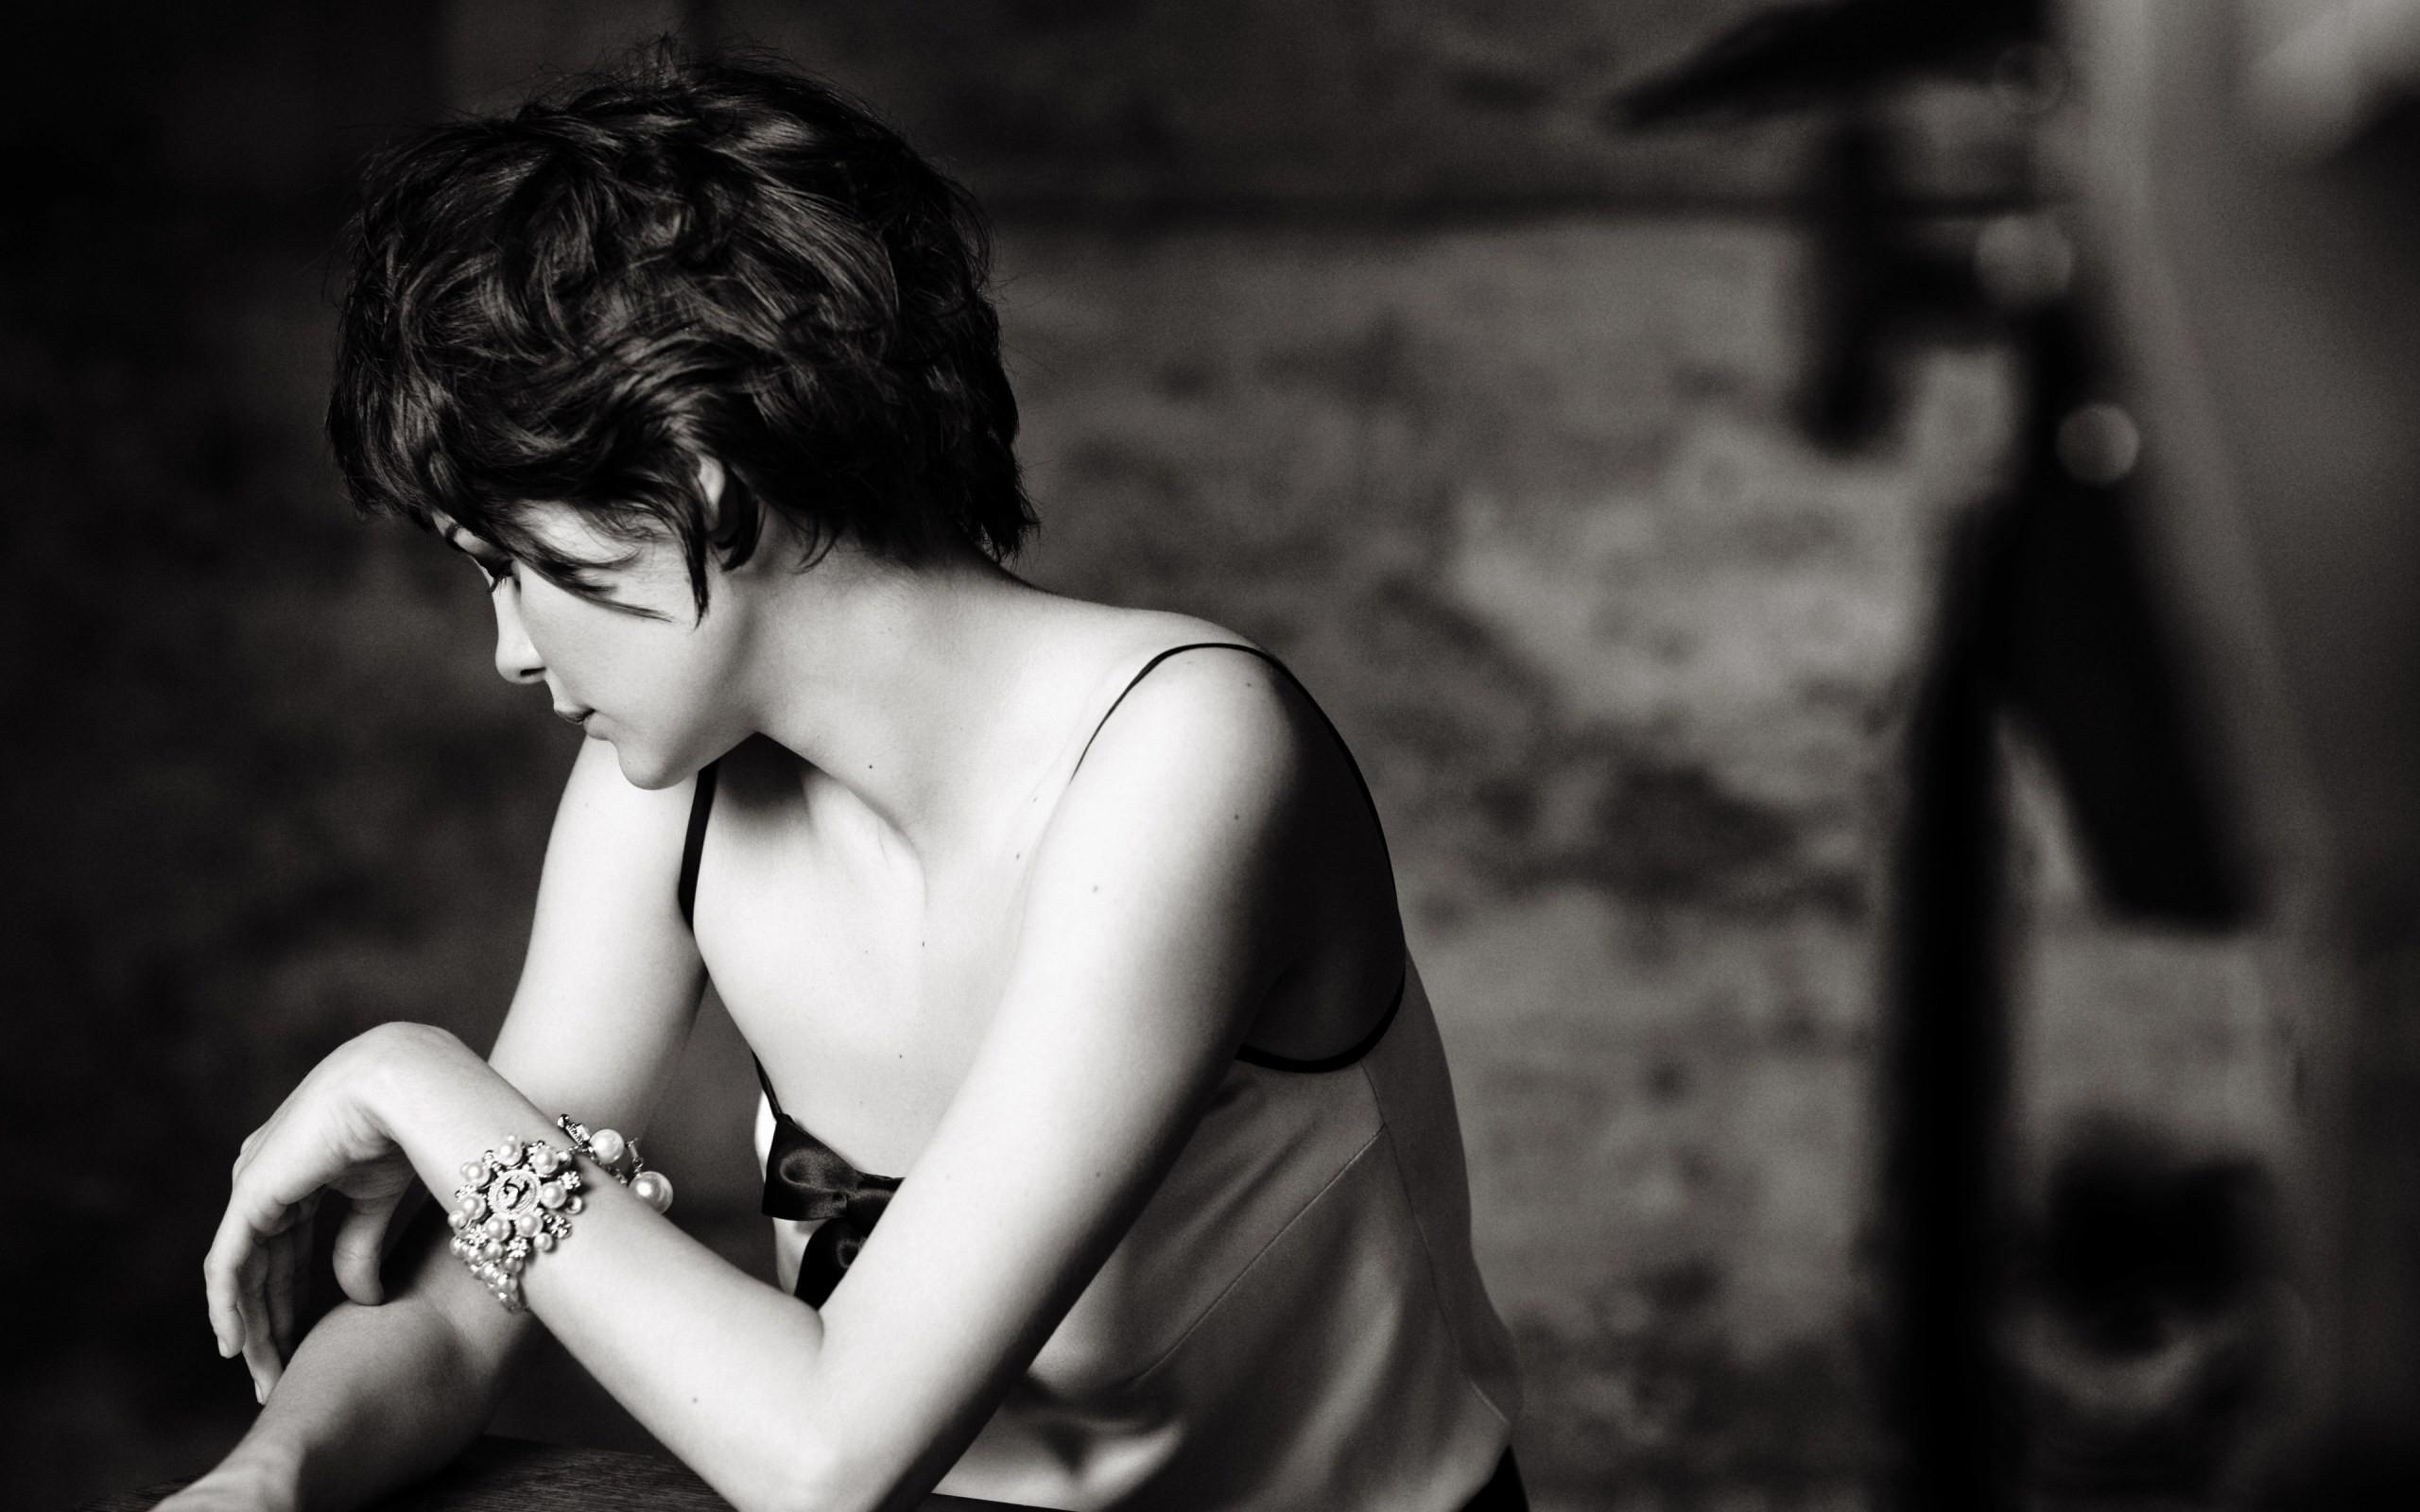 Actress, Monochrome, Audrey Tautou, Short Hair, Face, Girl In Audrey Tautou Short Haircuts (View 21 of 25)